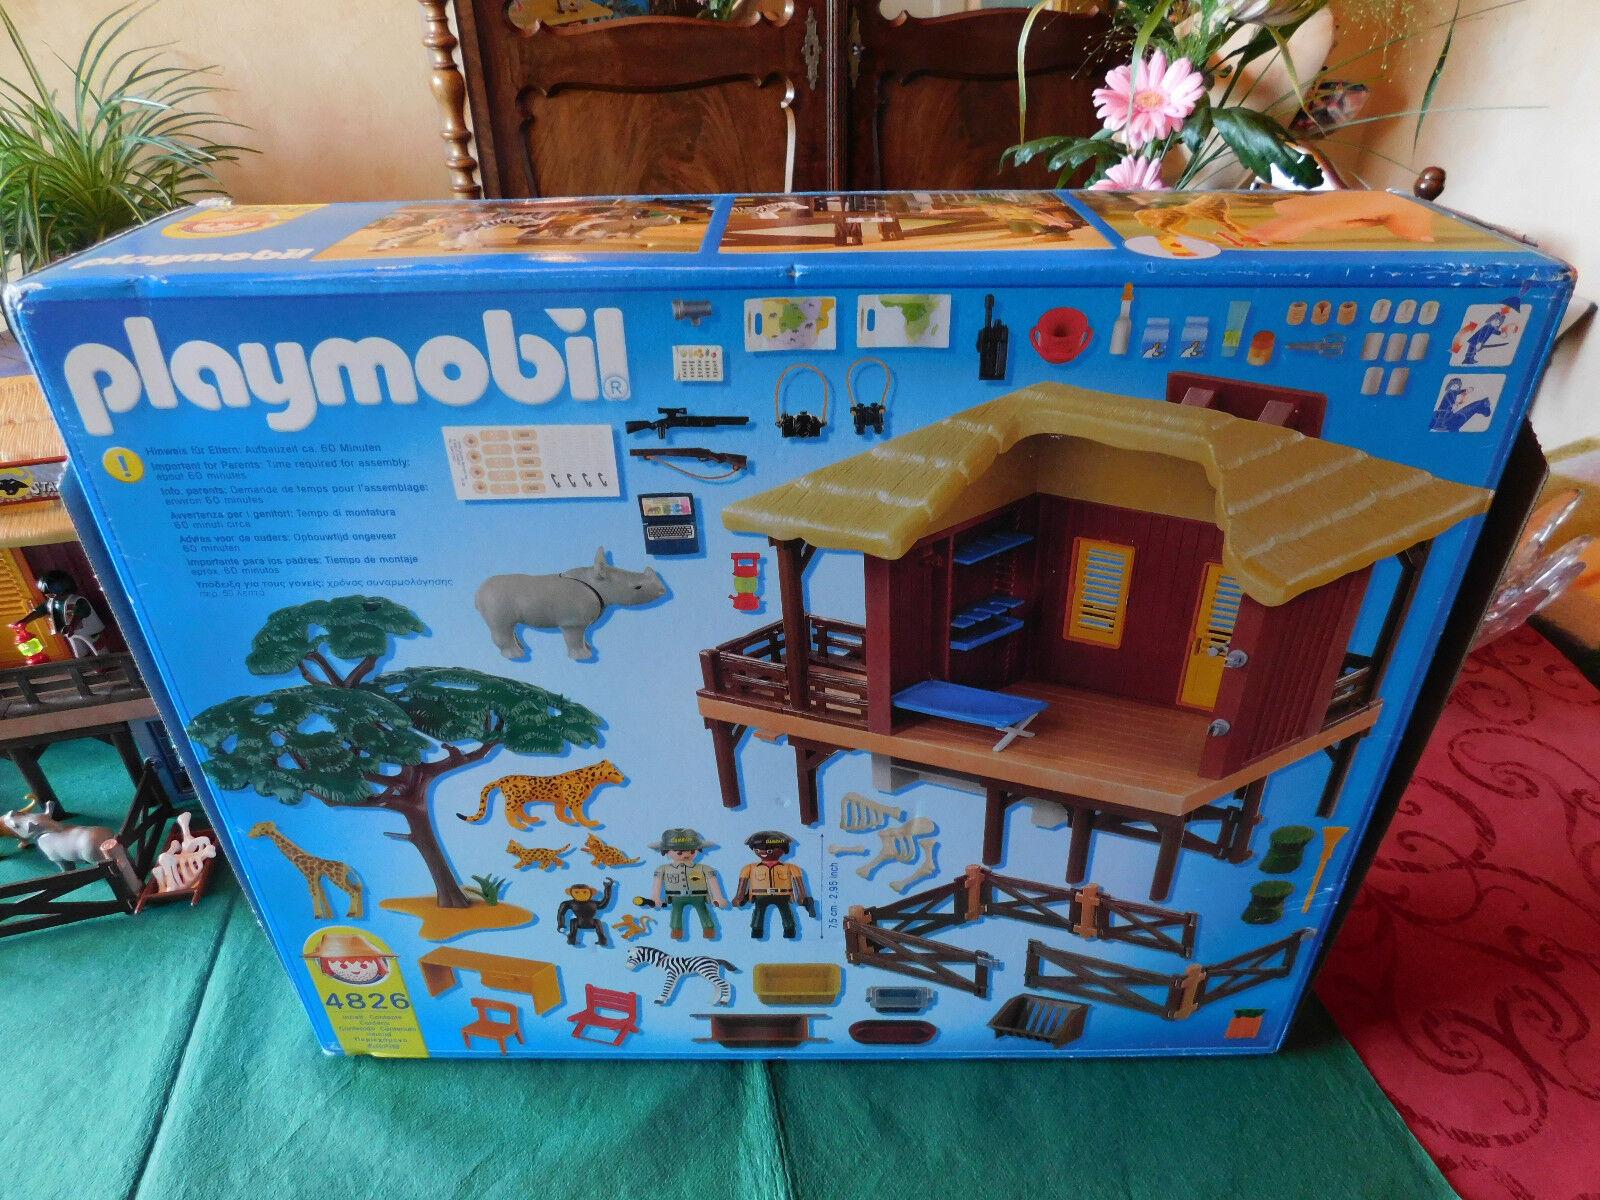 Playmobil OVP Wildtierpflegestation Oambati 4826-A/2009 mit Orig.-BA und OVP Playmobil 9a0854